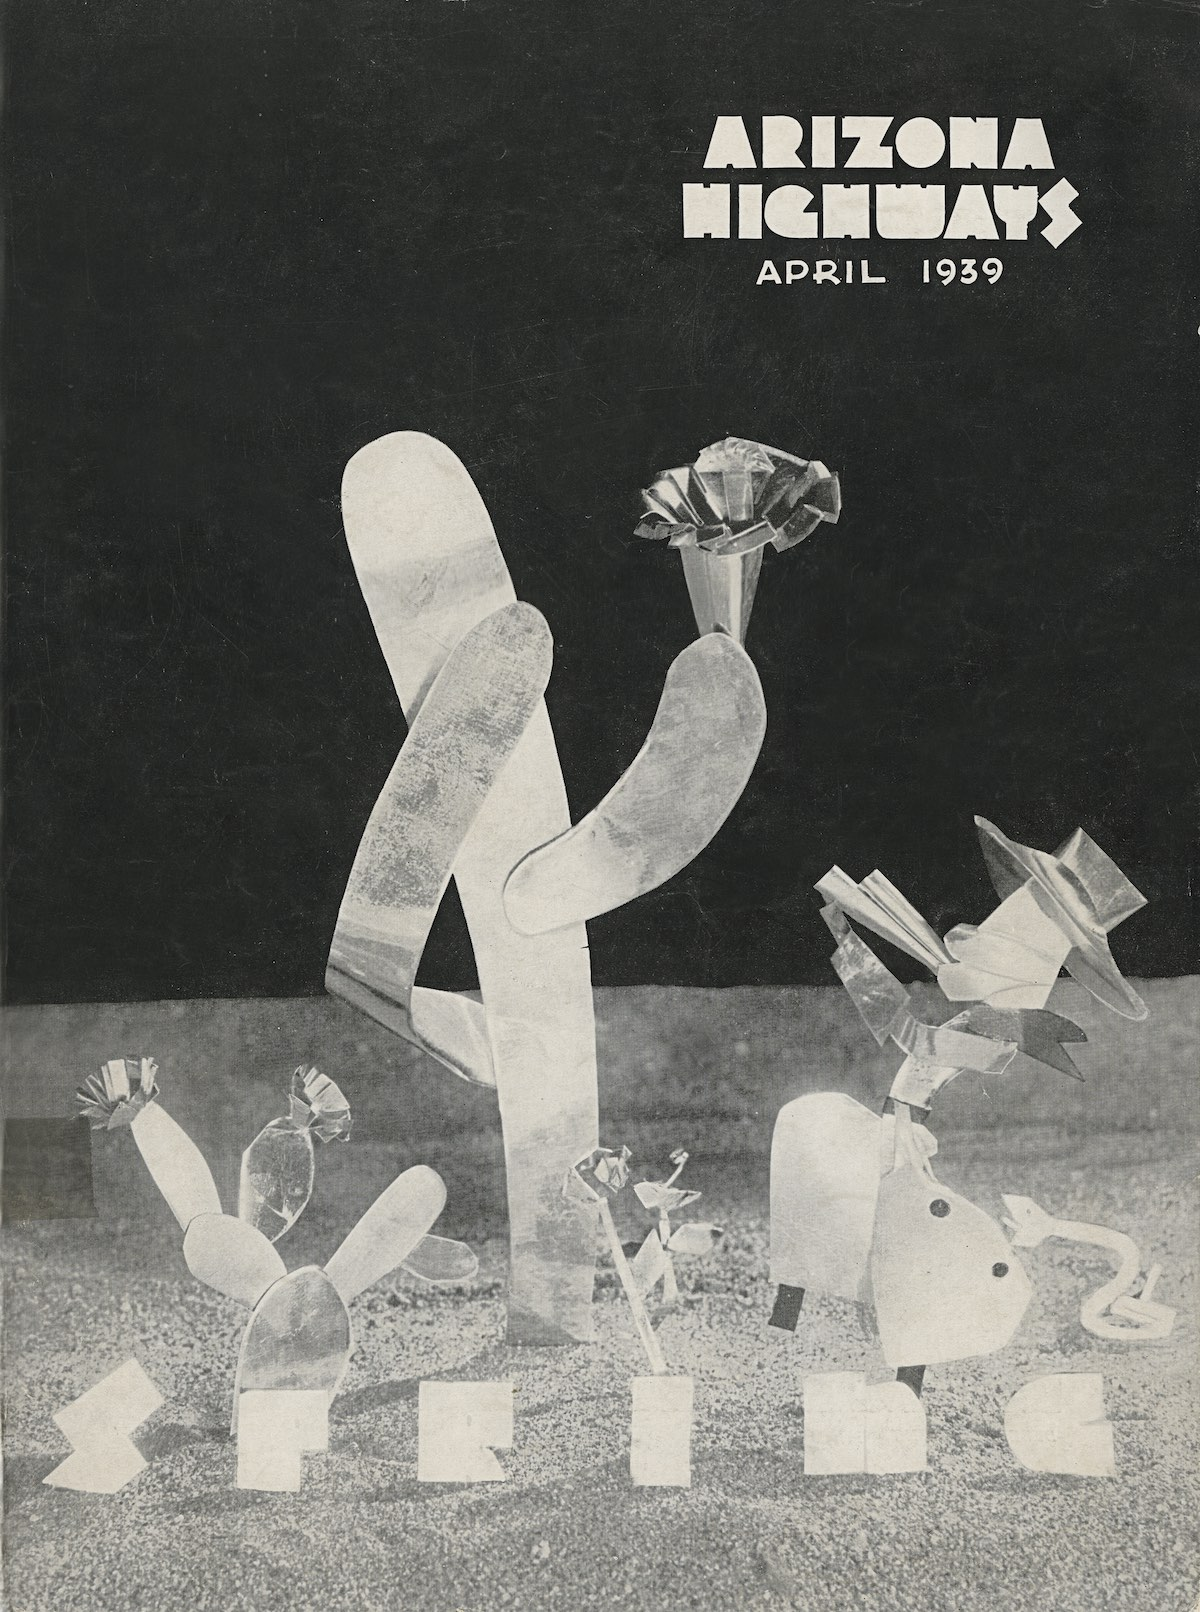 Arizona Highways April 1939 cover